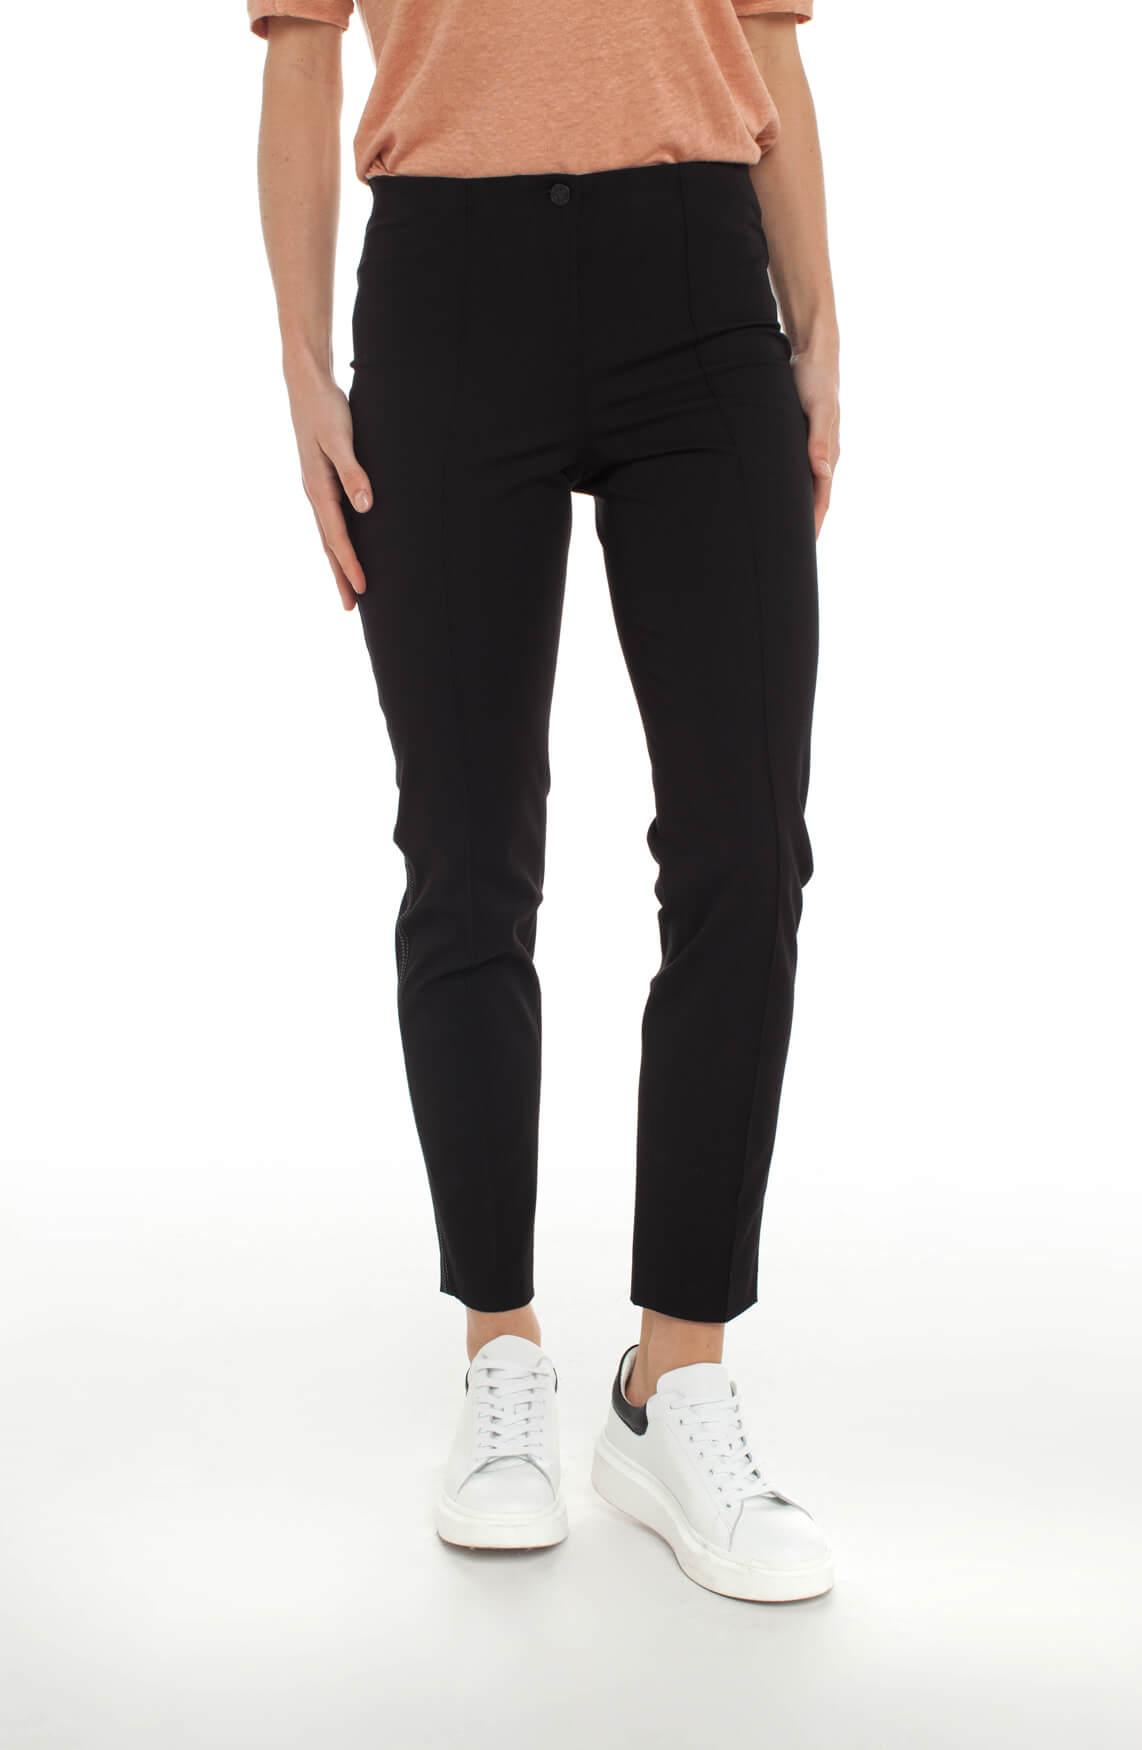 Cambio Dames Ros pantalon met contrasterende stiksels zwart